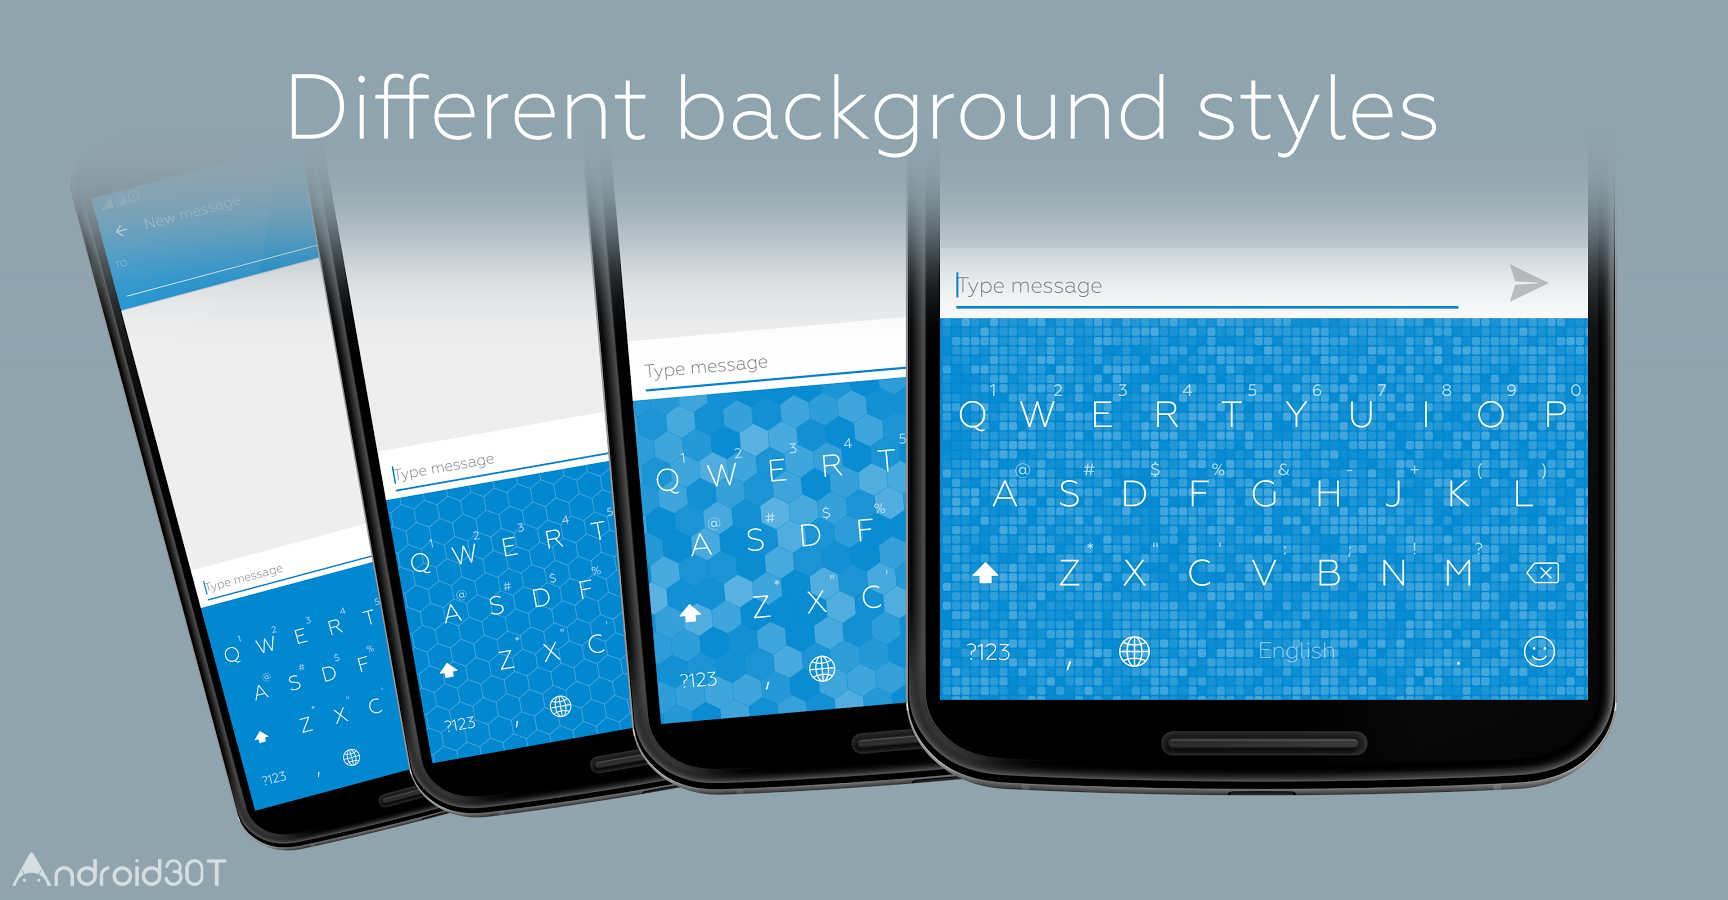 دانلود Flat Style Colored Keyboard Pro 3.5.0 – برنامه سفارشی سازی کیبورد اندروید